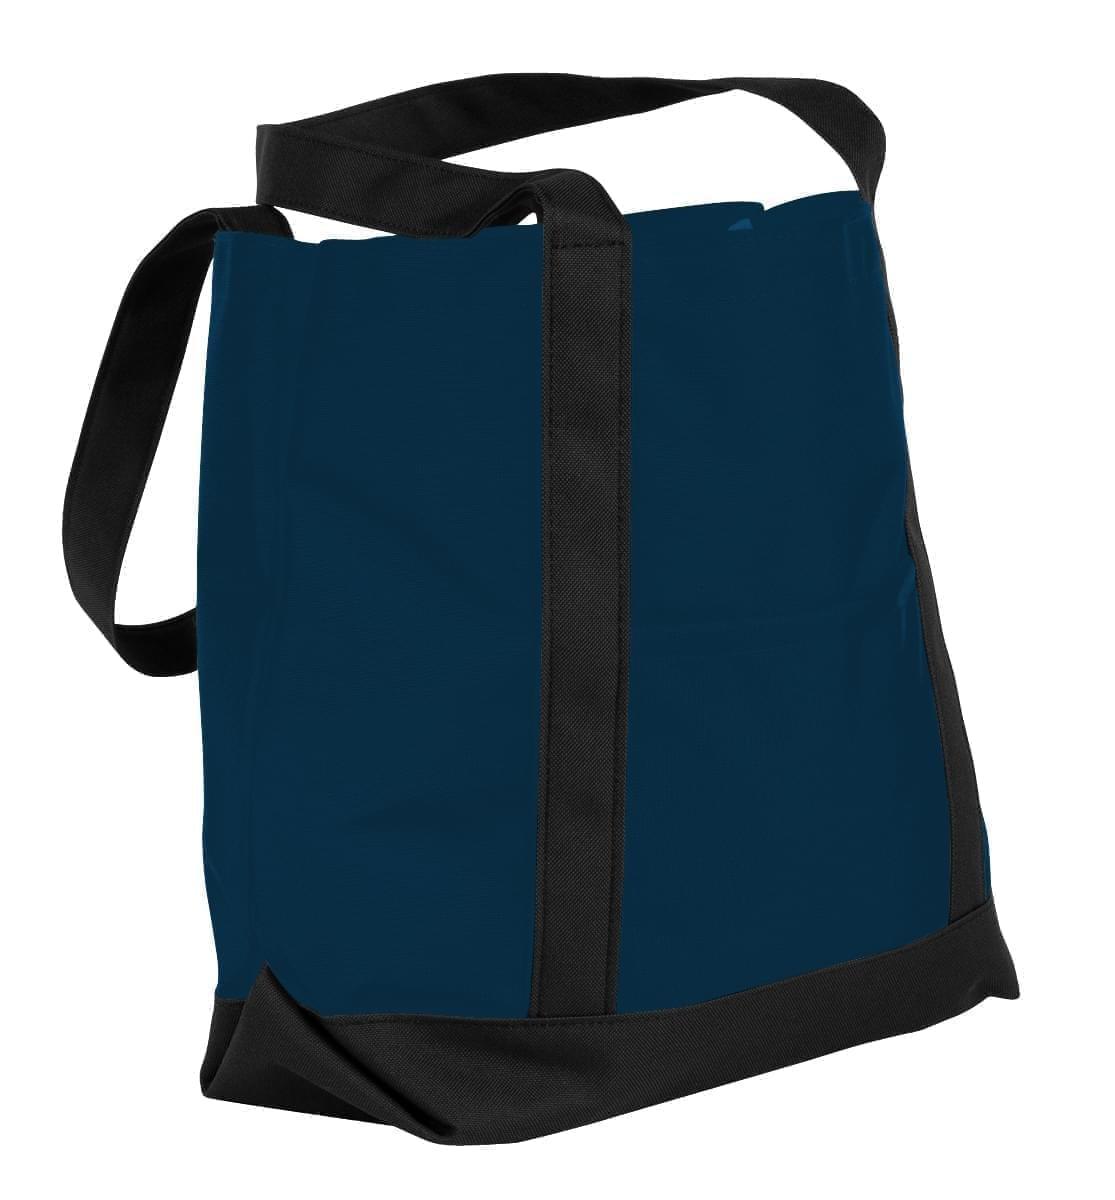 USA Made Nylon Poly Boat Tote Bags, Navy-Black, XAACL1UAWC